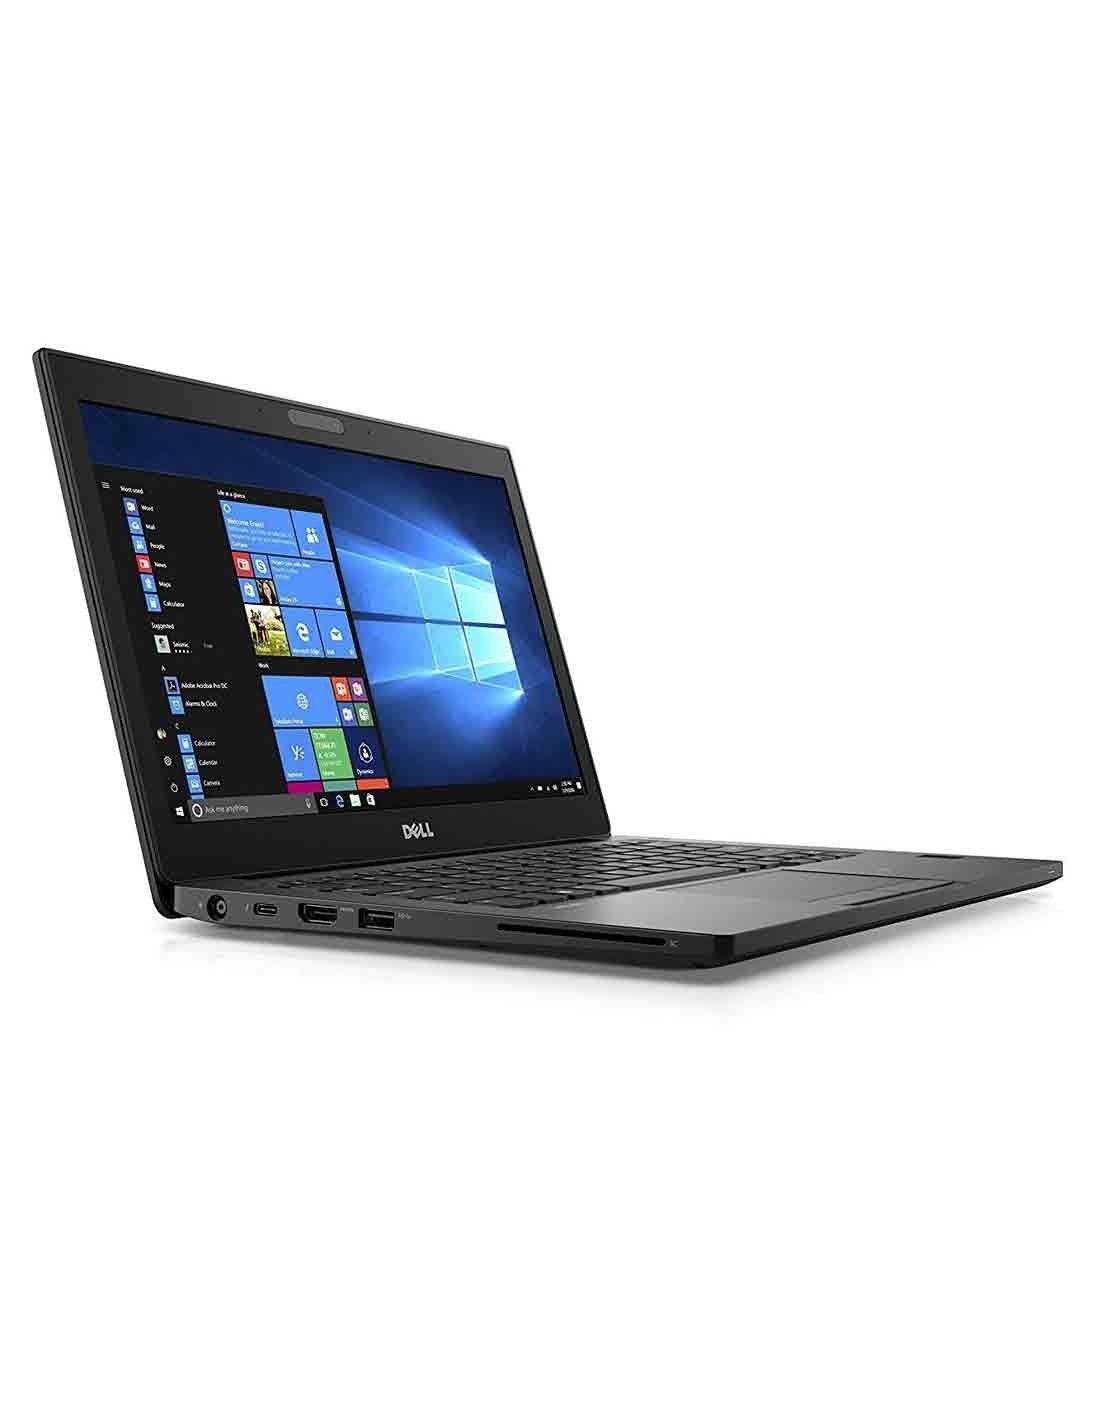 Dell Latitude 3580 Windows 10 Pro 64 Irix Computer Systems Trading Llc Distributor In Uae Business Laptop Dell Laptops Windows 10